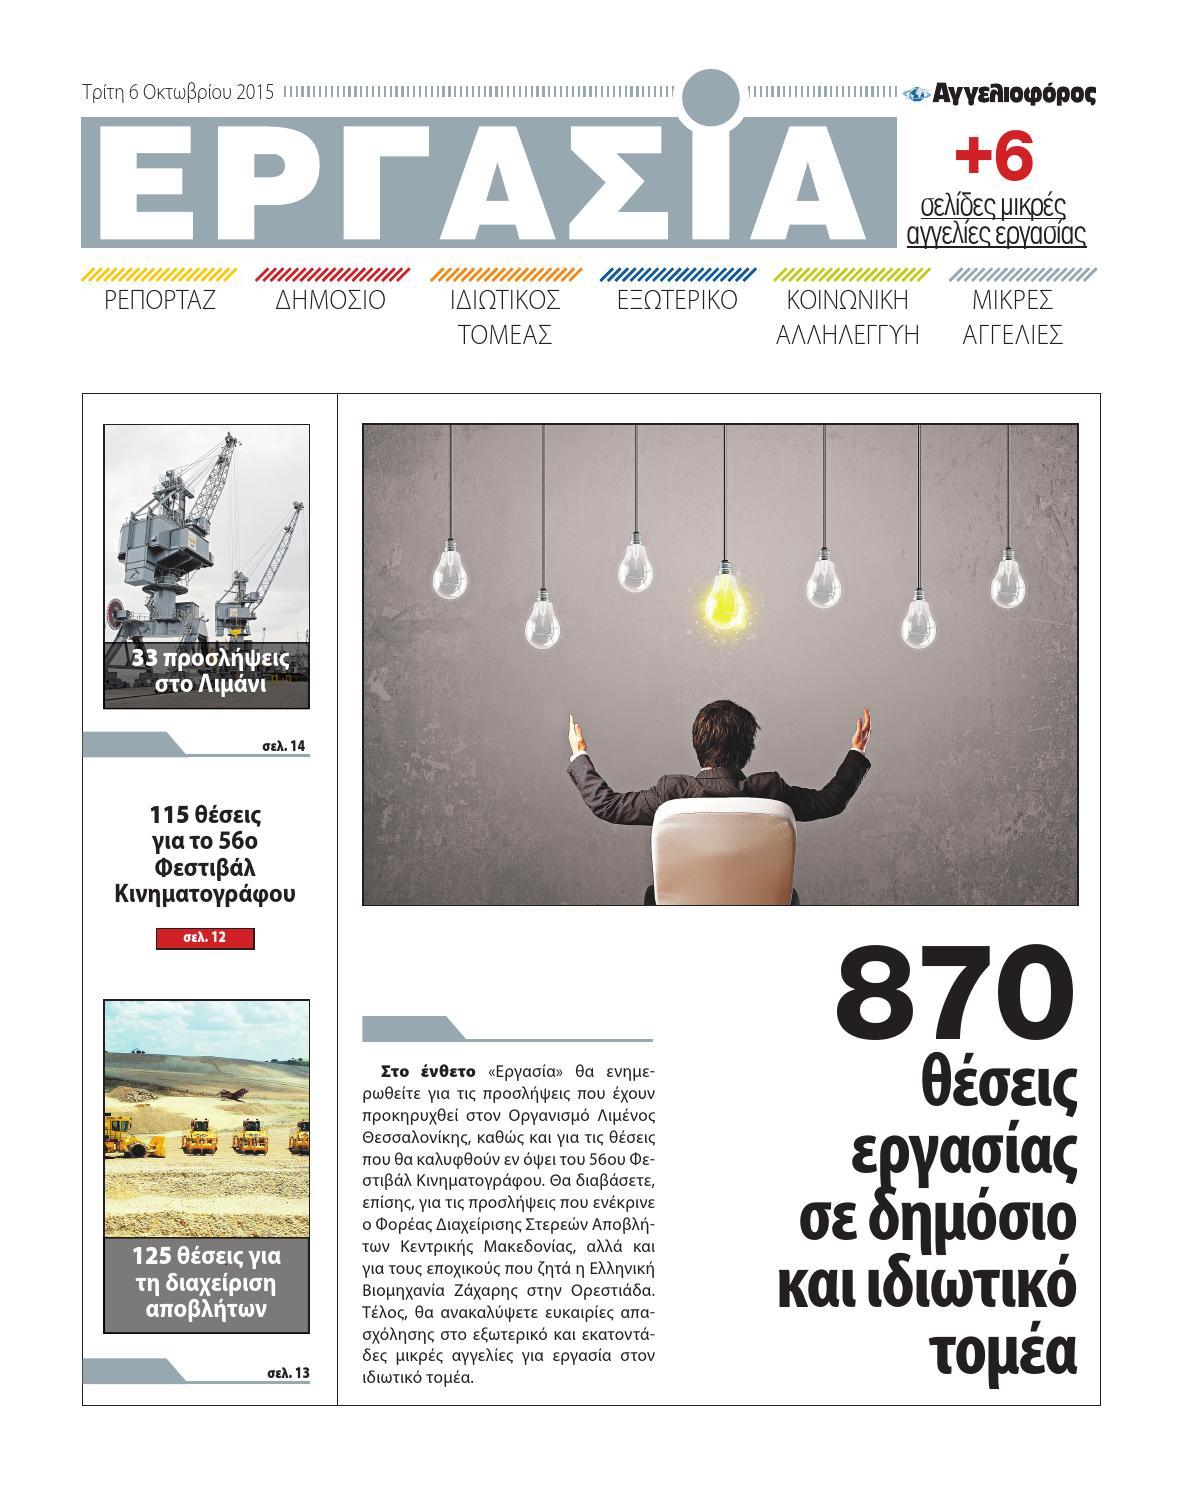 7098d98acf92 Εργασία 06 10 2015 by Εκδοτική Βορείου Ελλάδος Α.Ε. - issuu